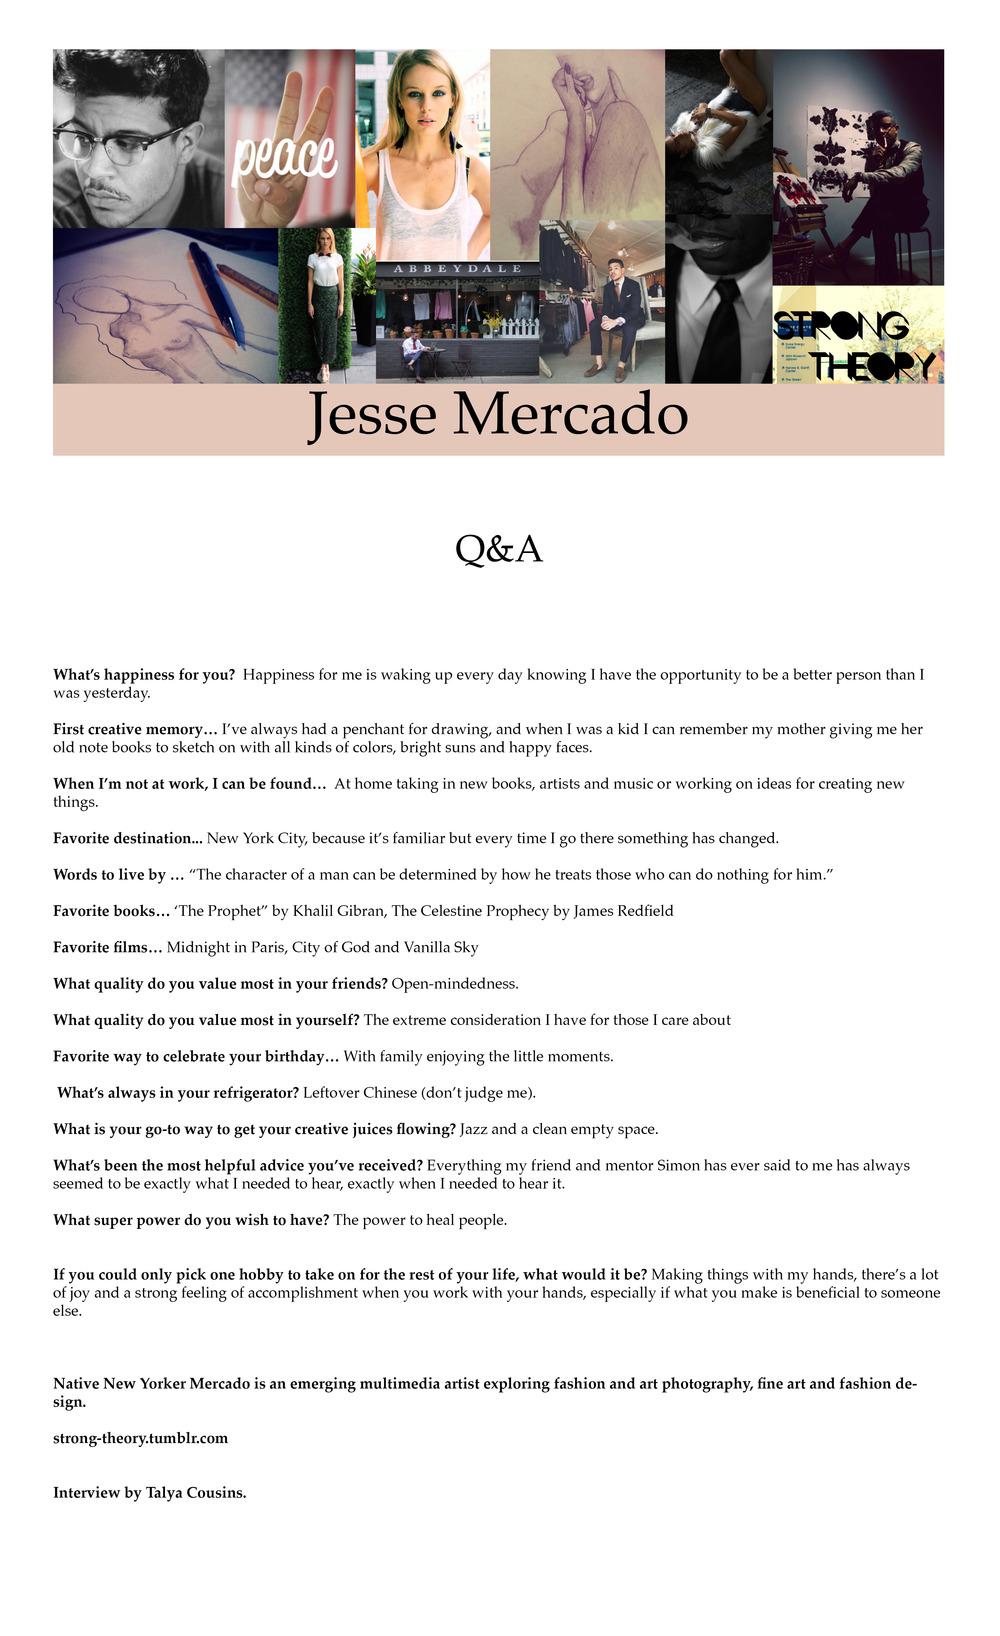 Jesse Mercado Q&A.jpg